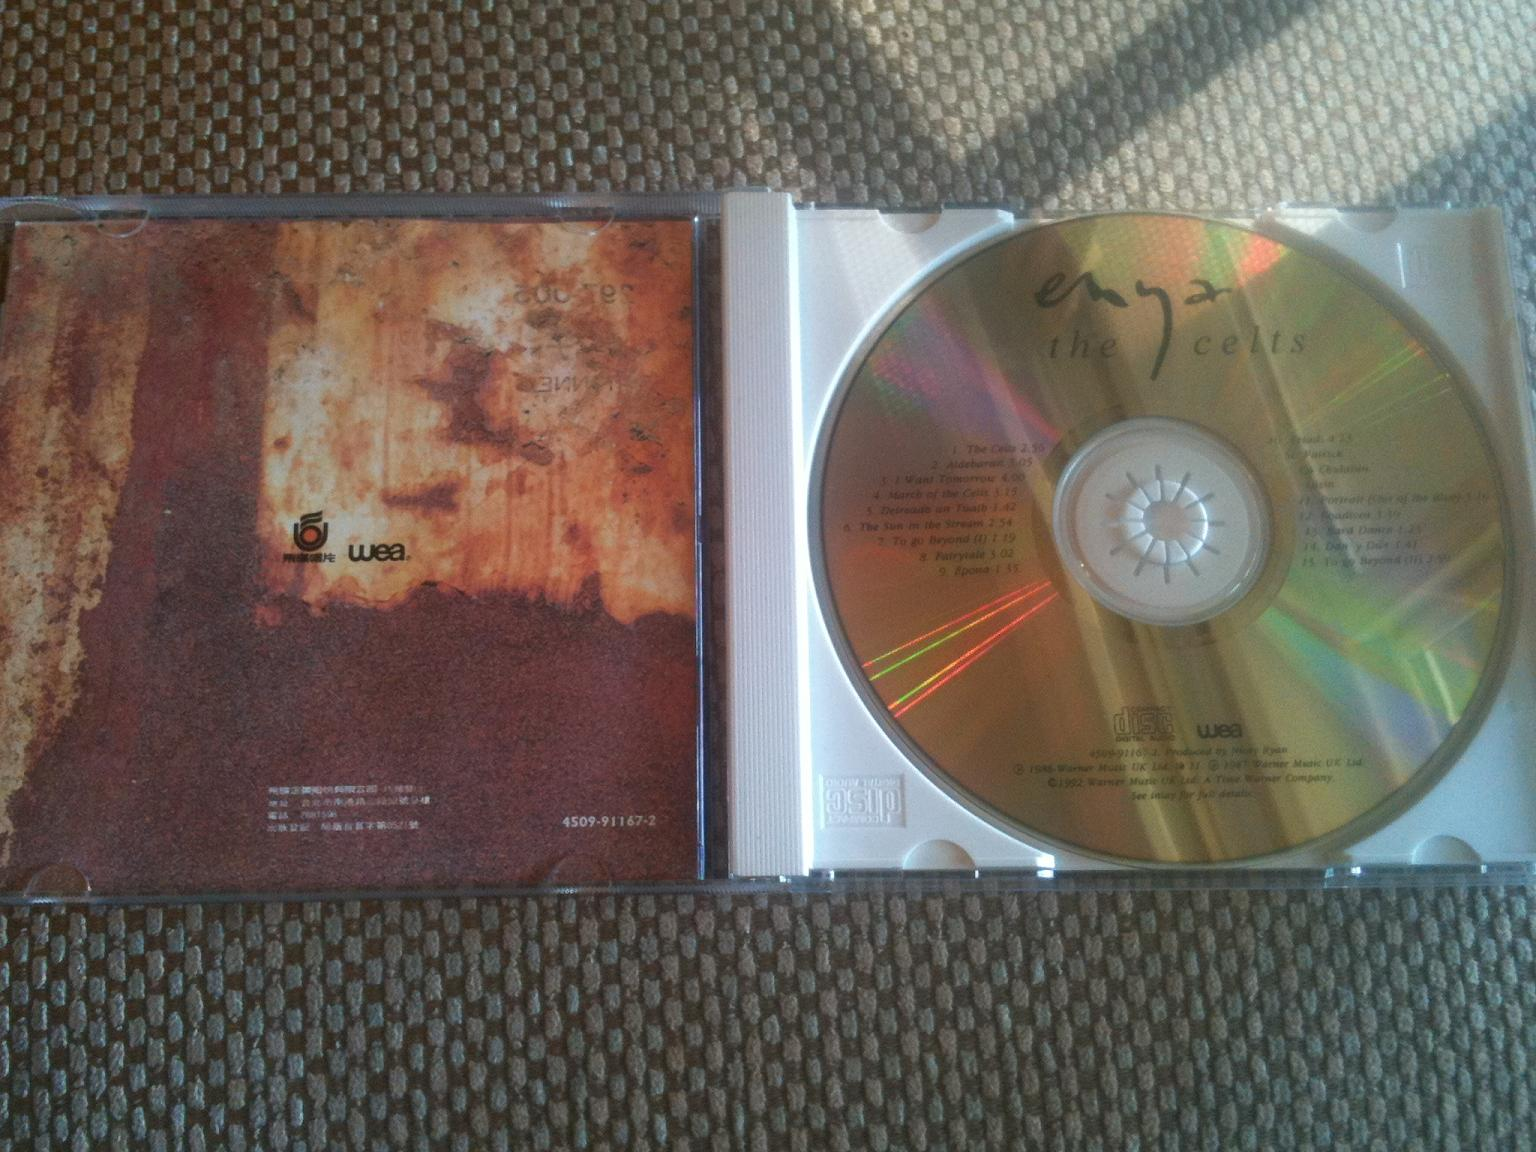 Enya CDs 206.JPG